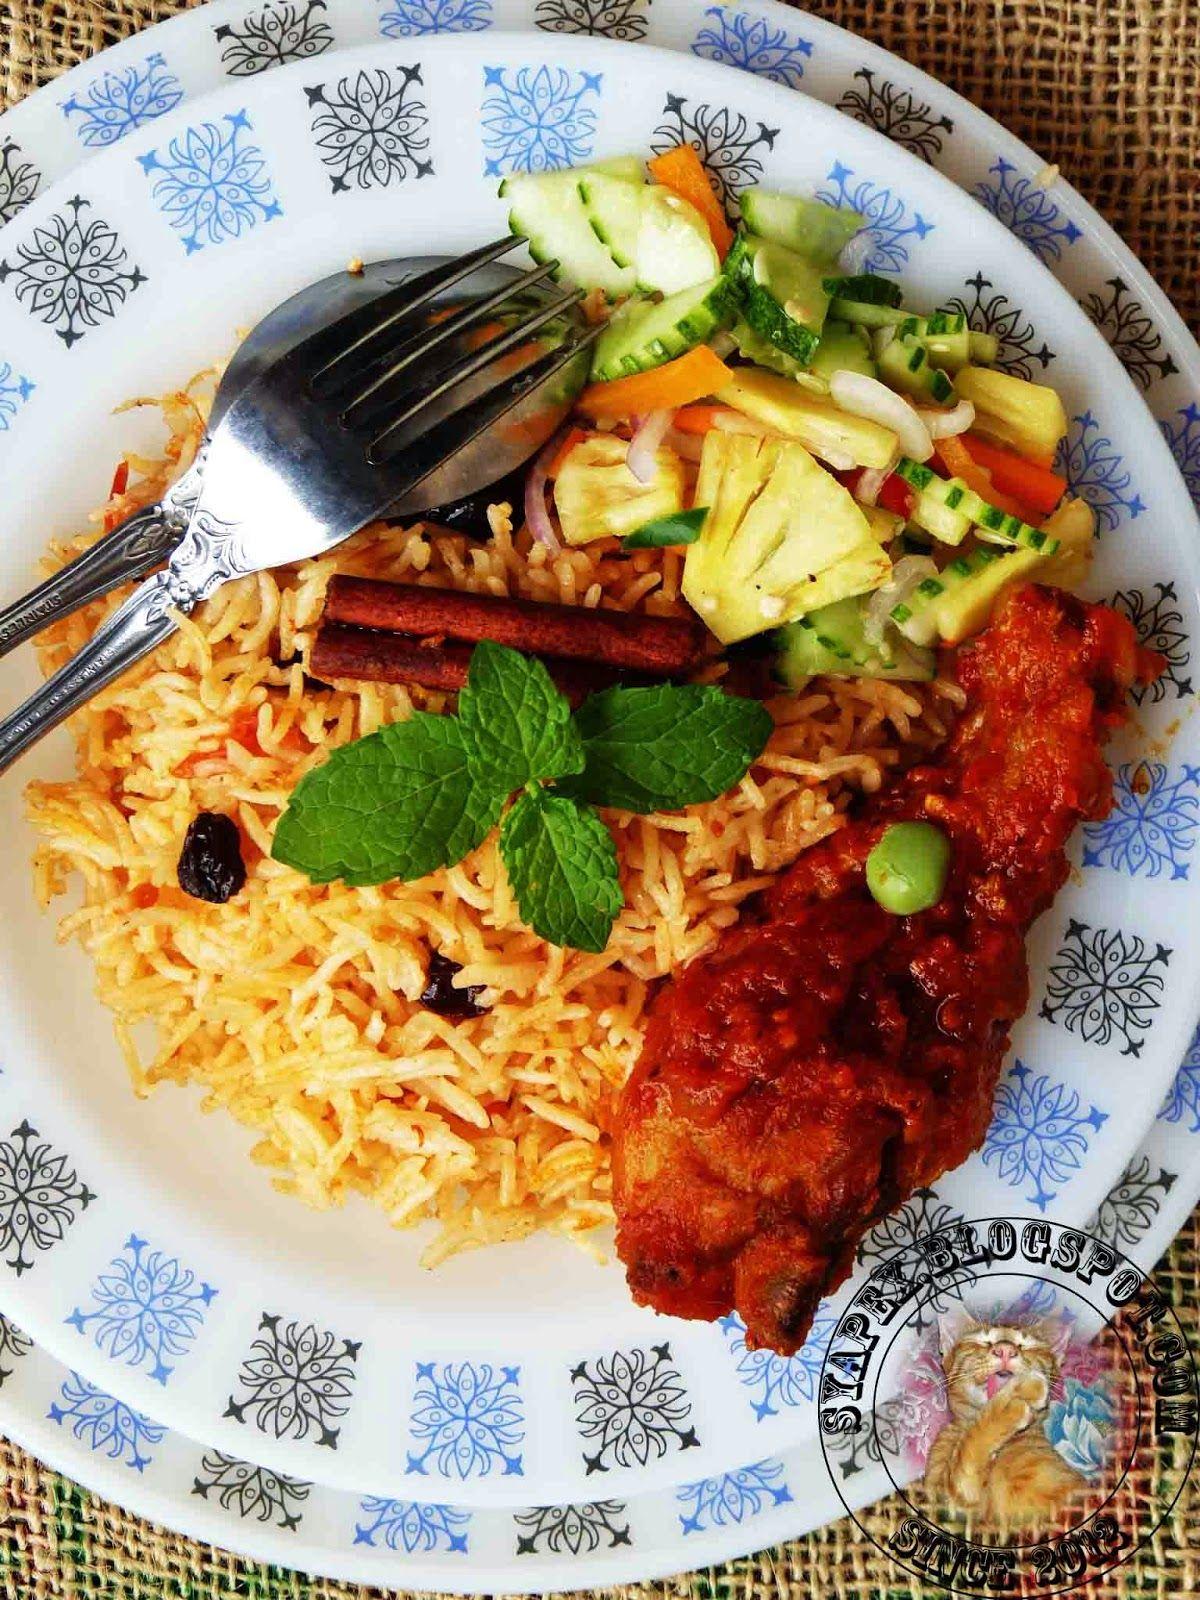 Nasi Tomato Ayam Masak Merah Dan Acar Timun Nenas Resep Masakan Asia Resep Masakan Malaysia Resep Makanan